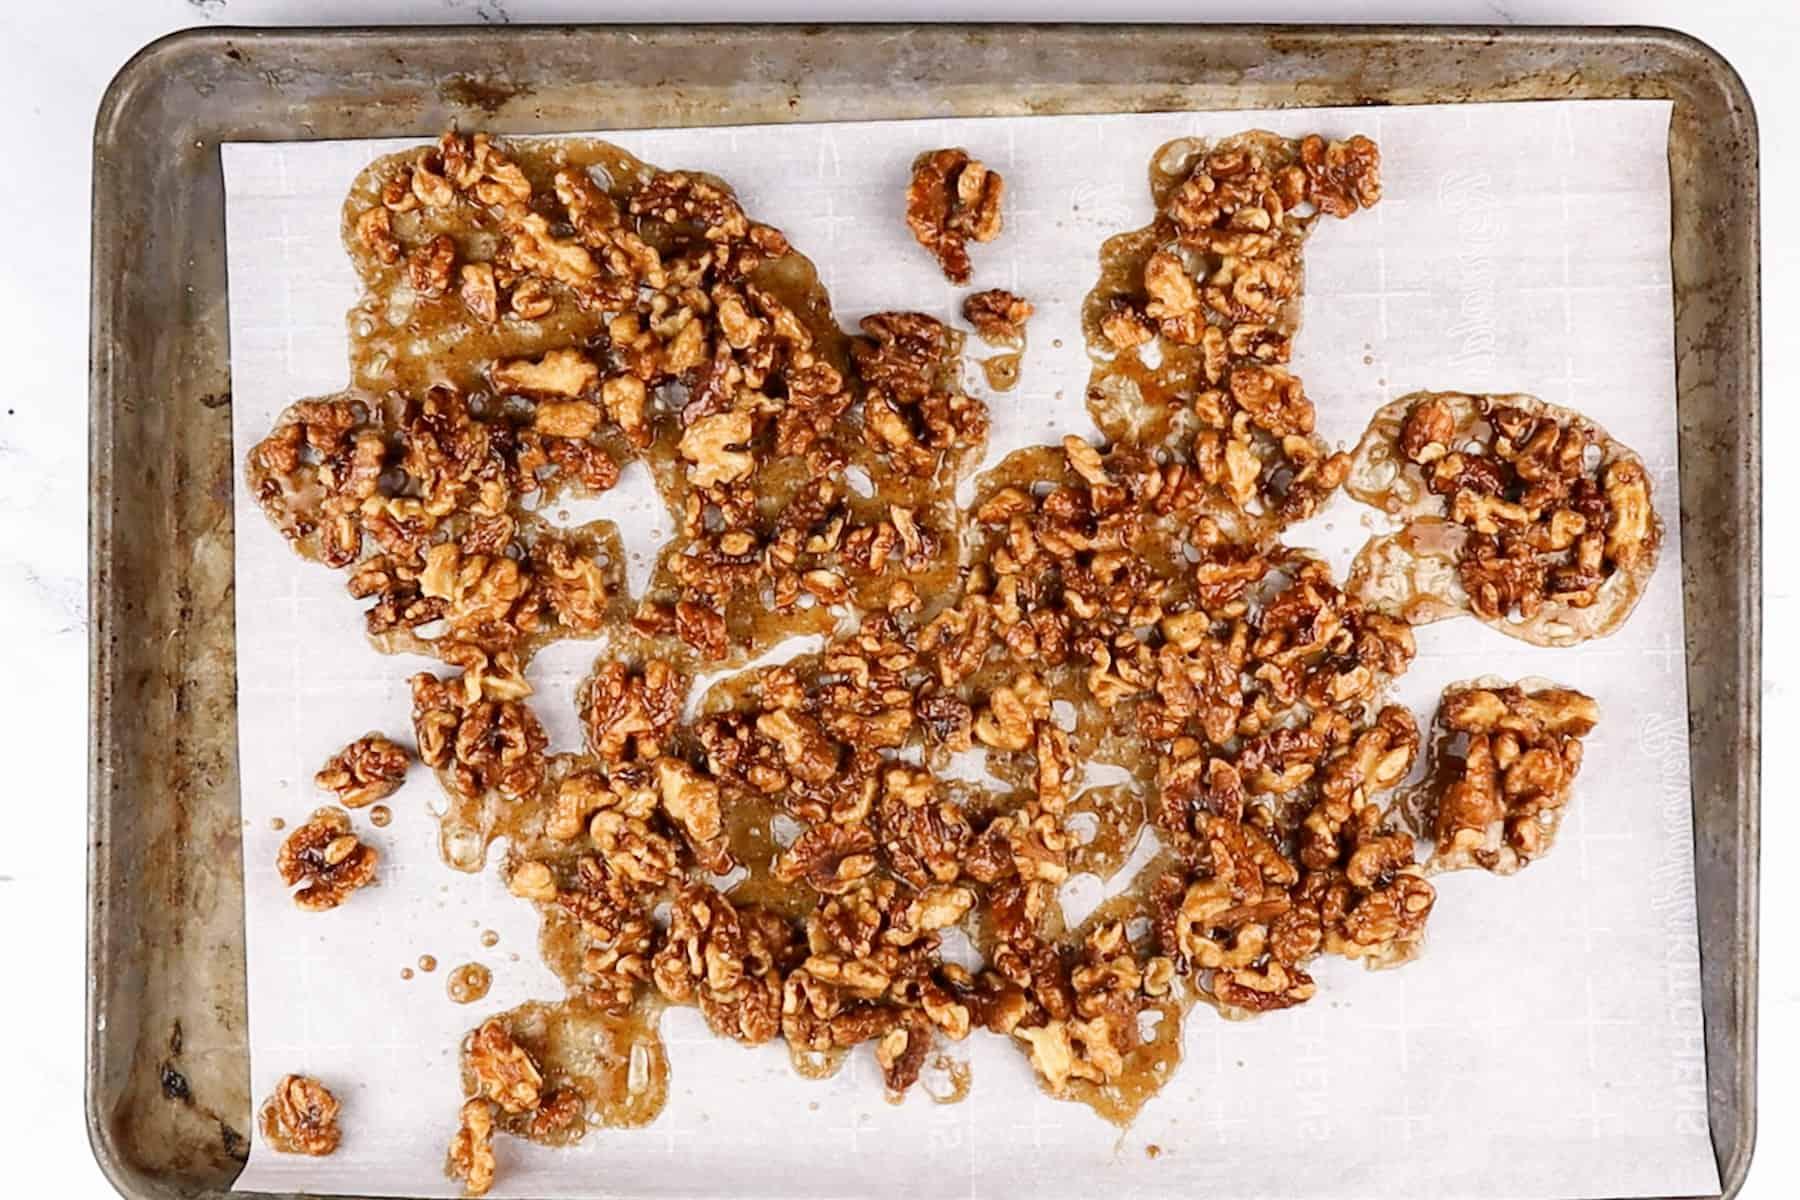 walnuts on baking sheet after baking